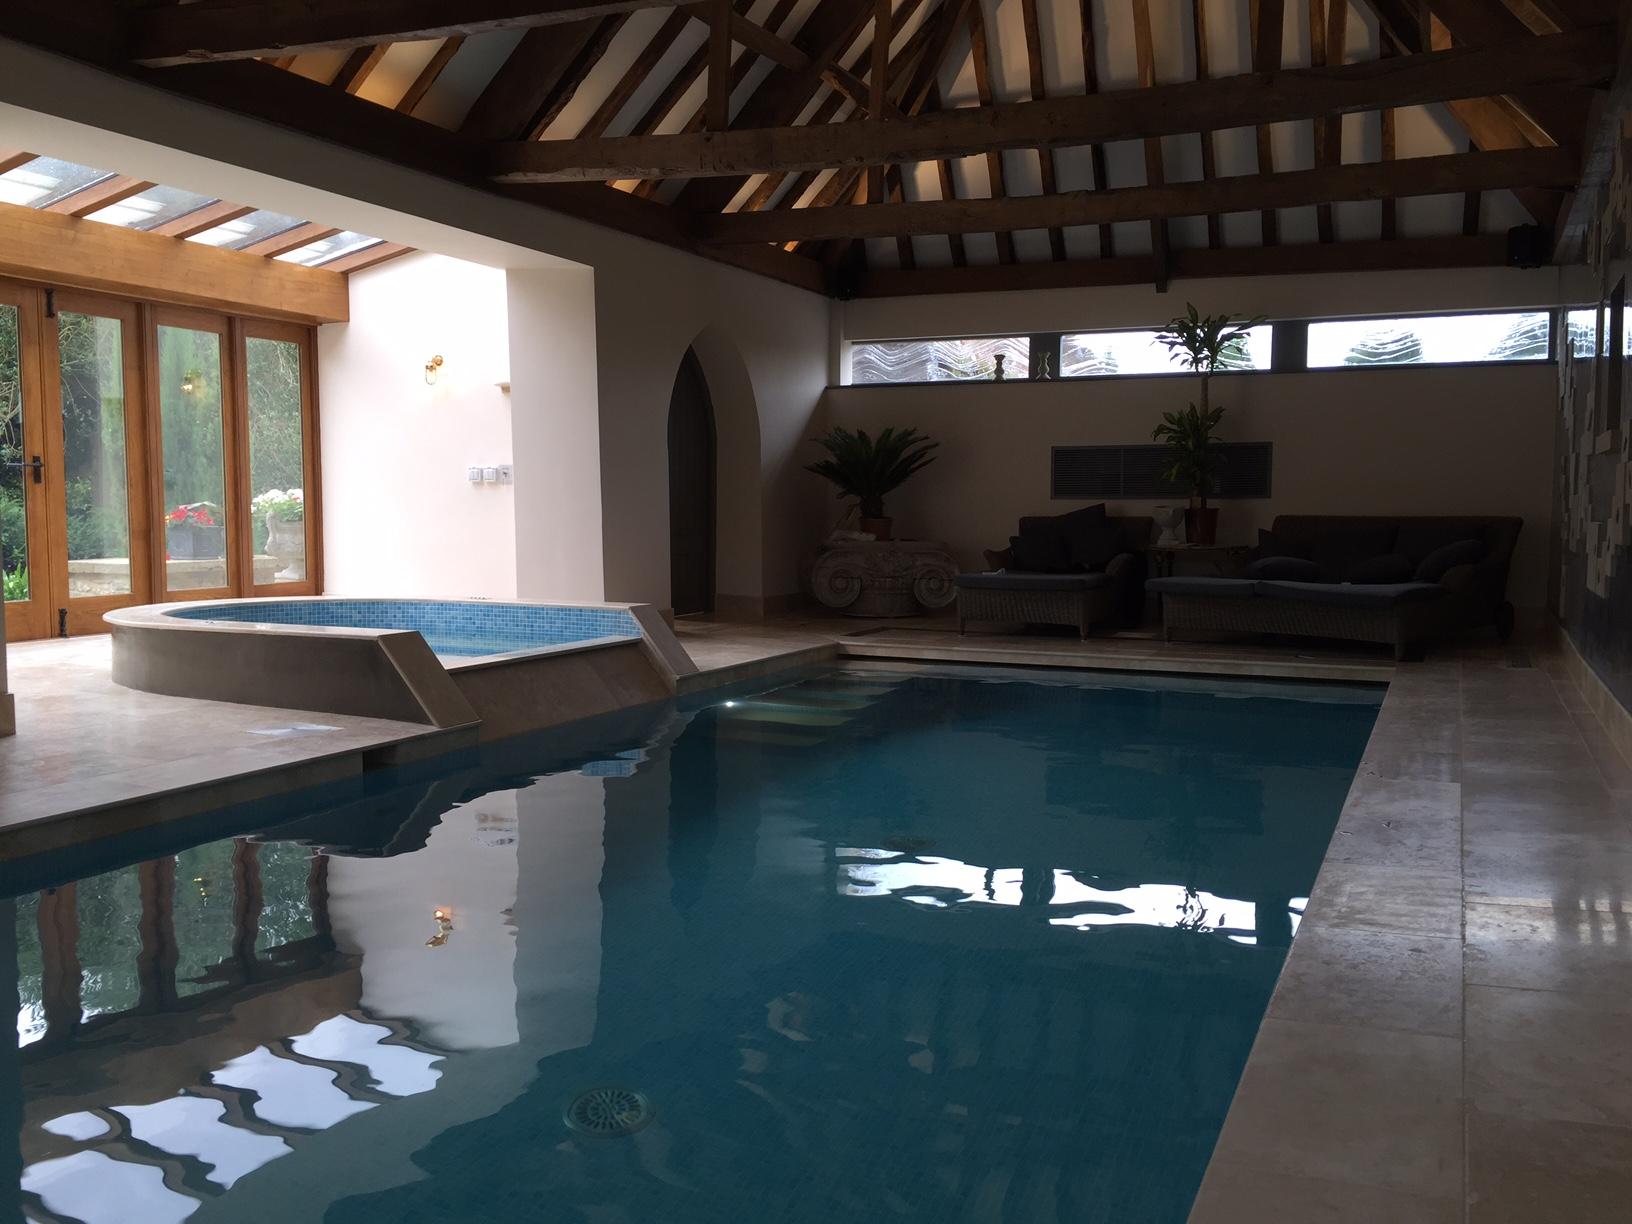 east coker yeovil bos leisure bristol hot tubs bristol hot tubs bath swimming pools bath